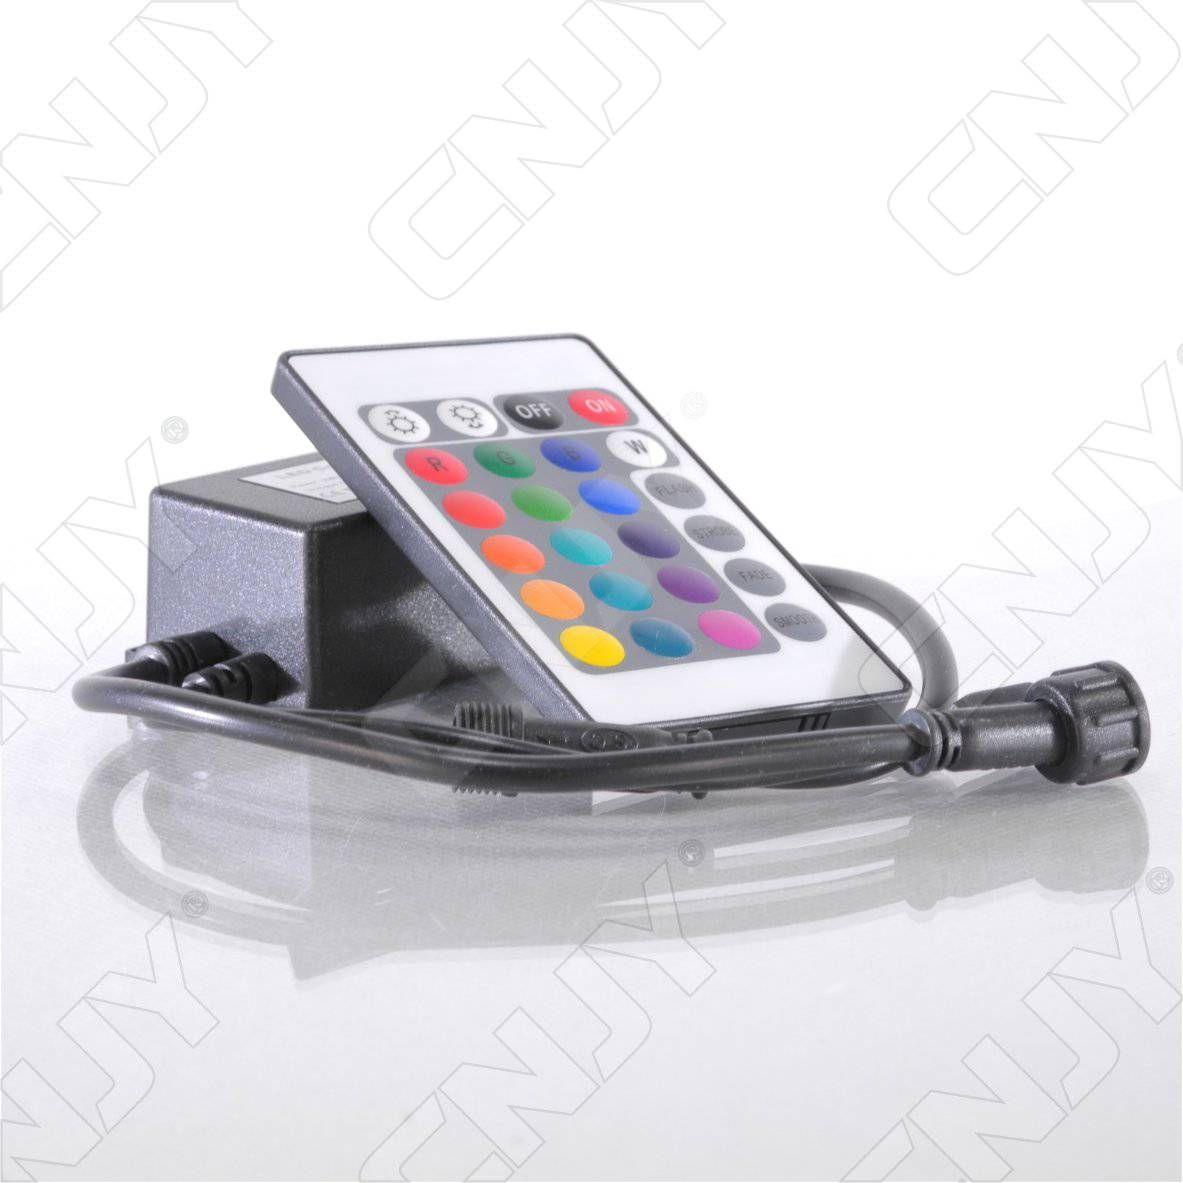 Boitier de contrôle led multicolore RGB